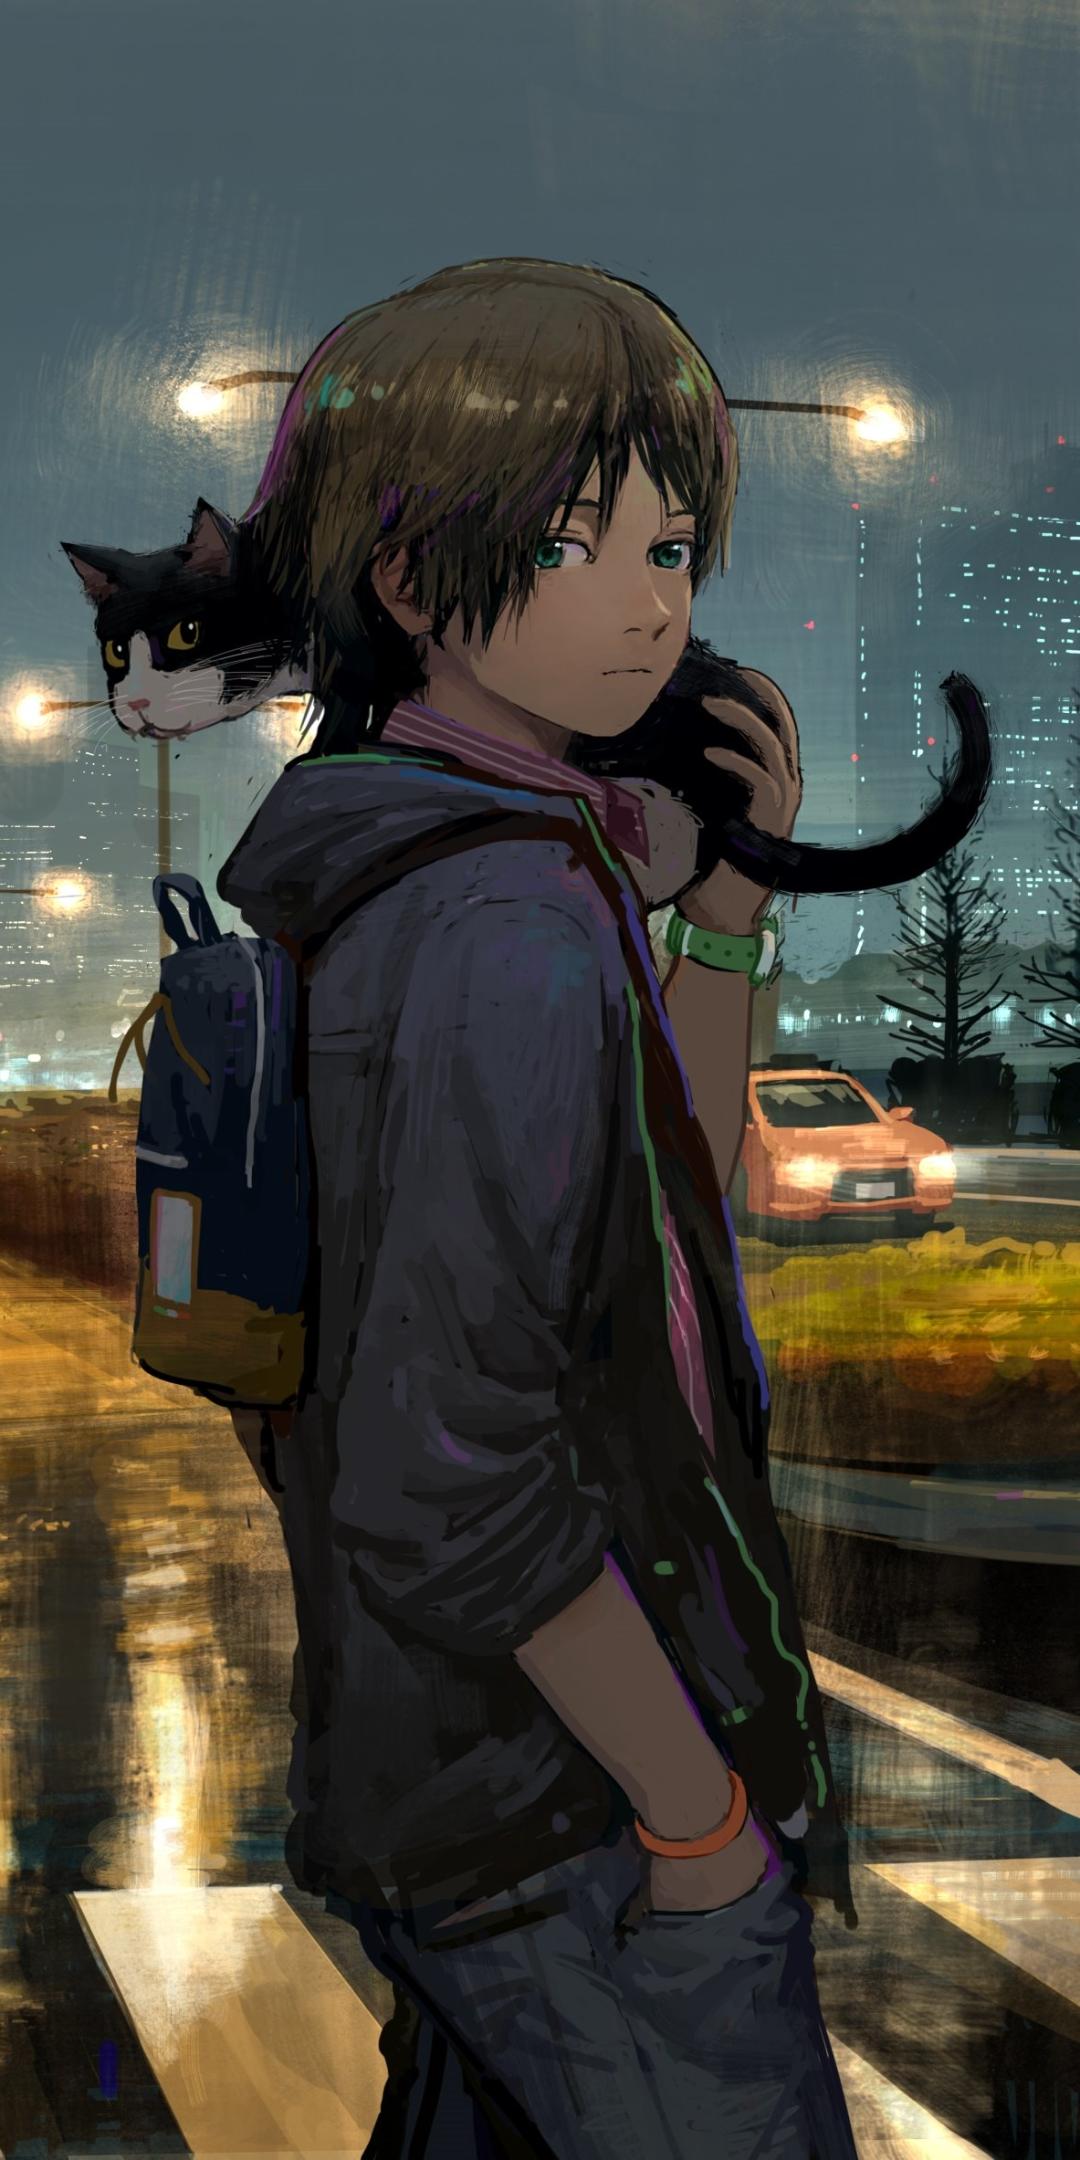 Boy Anime Wallpaper Phone 1080x2160 Wallpaper Teahub Io